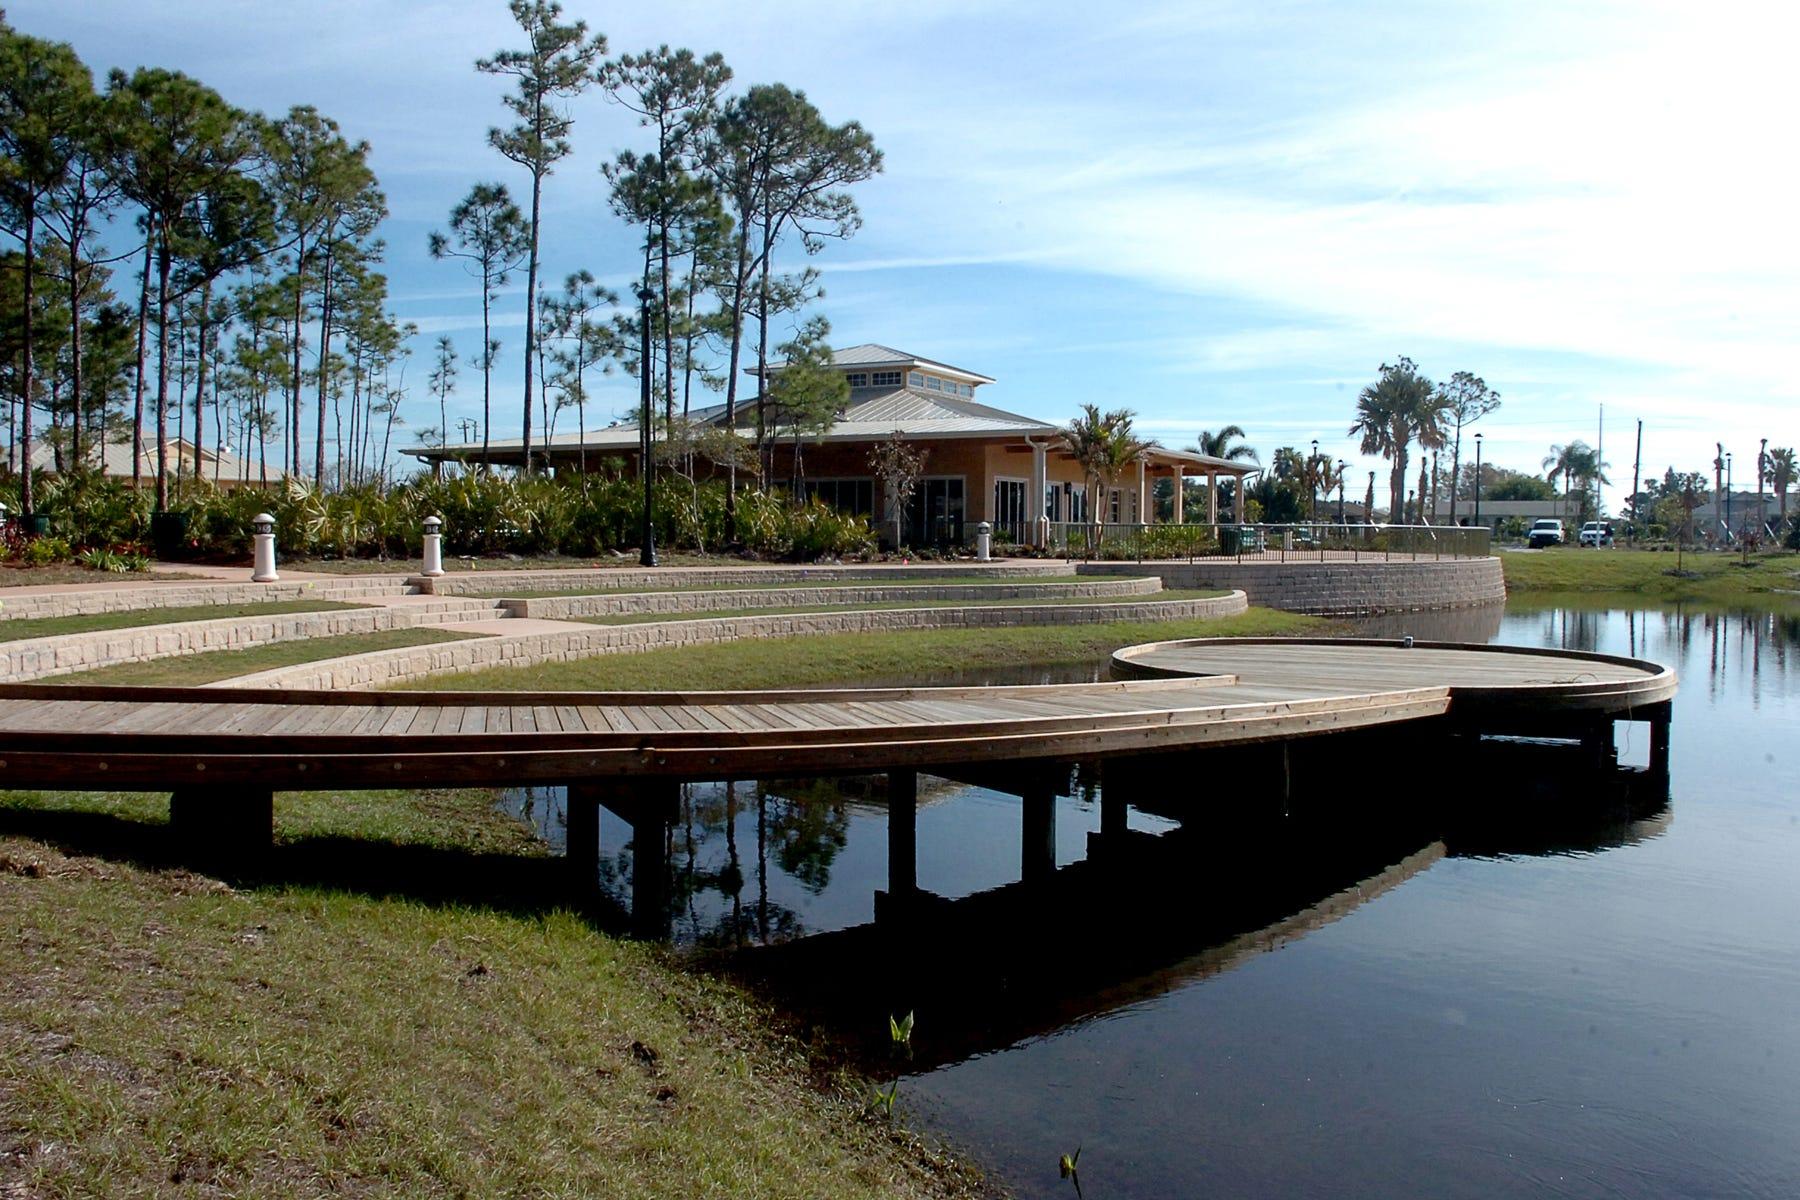 Beau The Port St. Lucie Botanical Garden